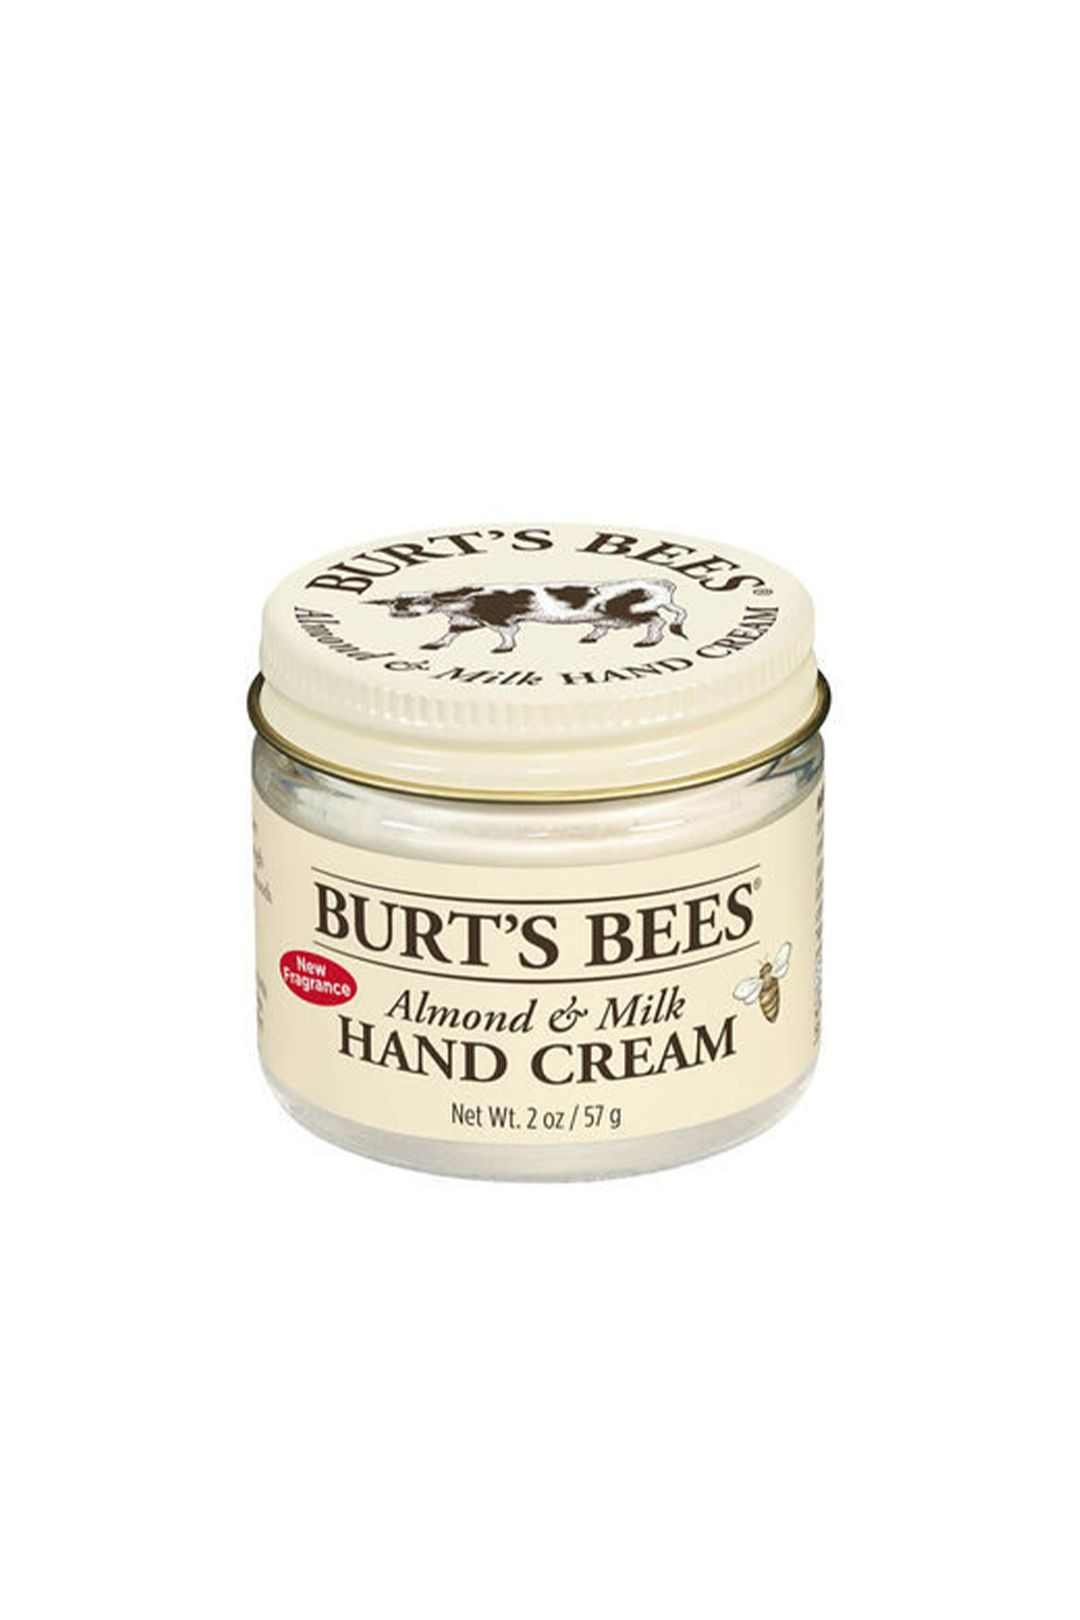 burts-bees-almond-milk-hand-creme